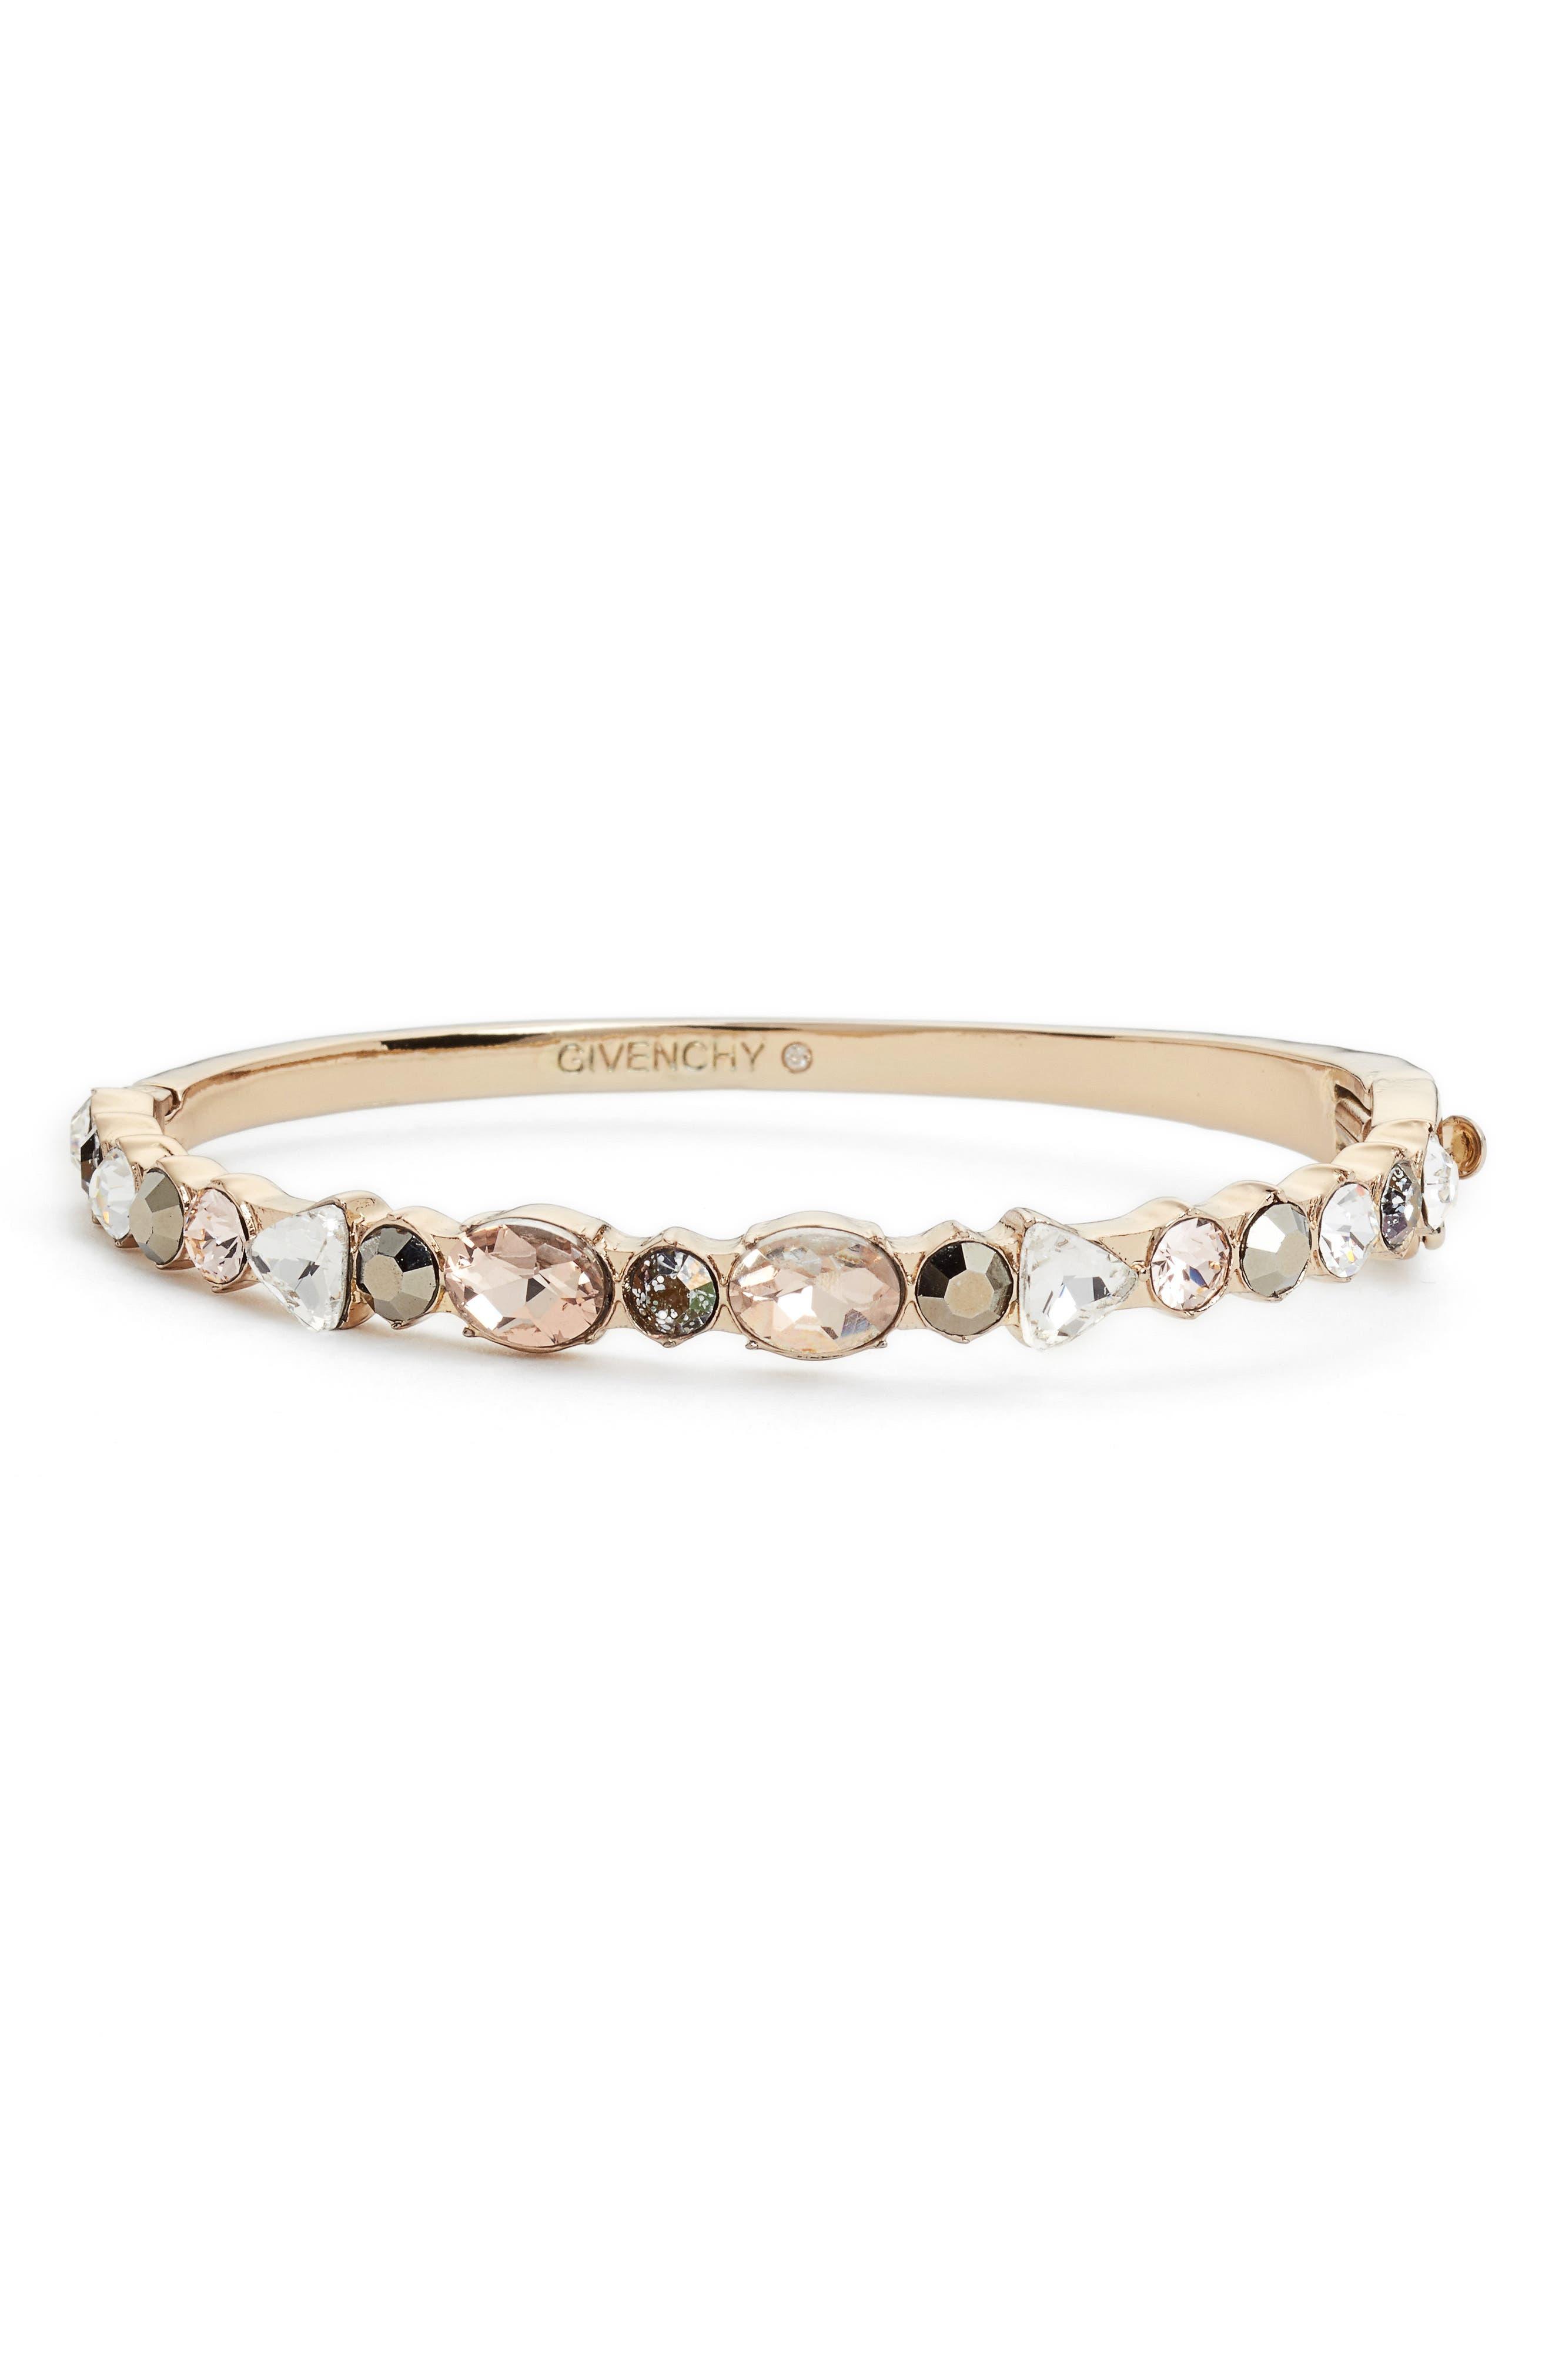 Main Image - Givenchy Swarovski Crystal Bracelet